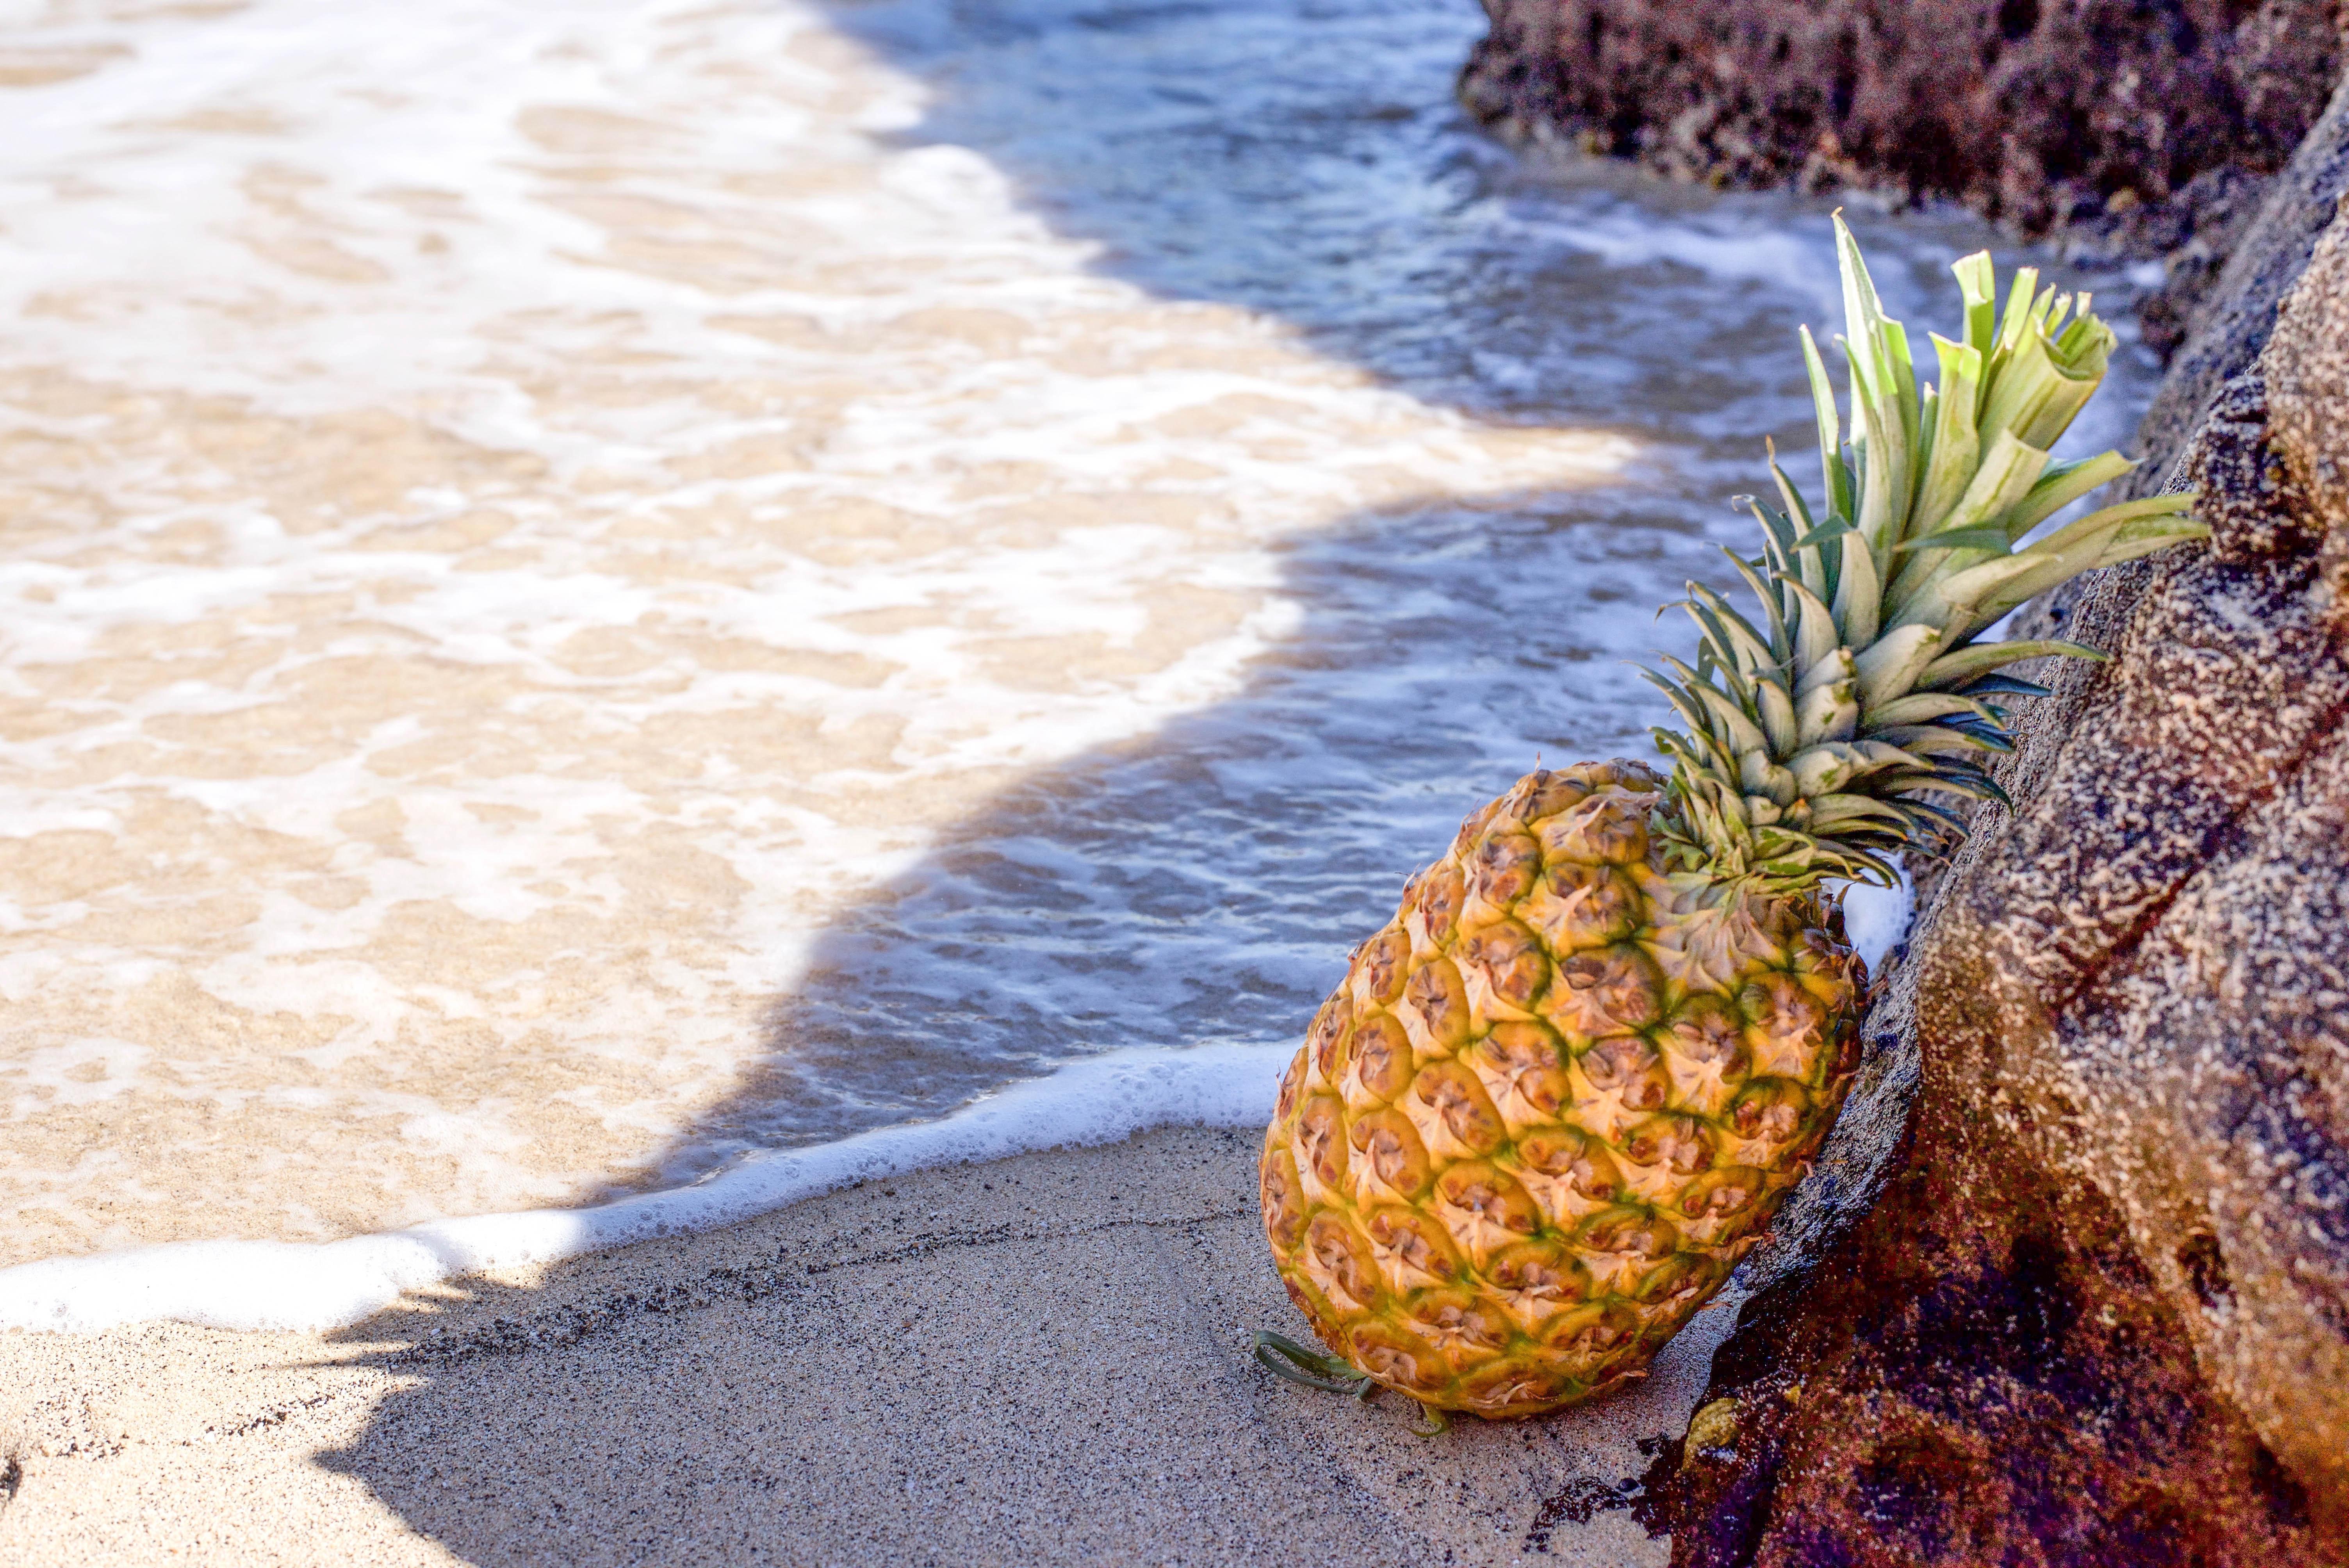 Pineapple in seashore leaning on brown rock photo